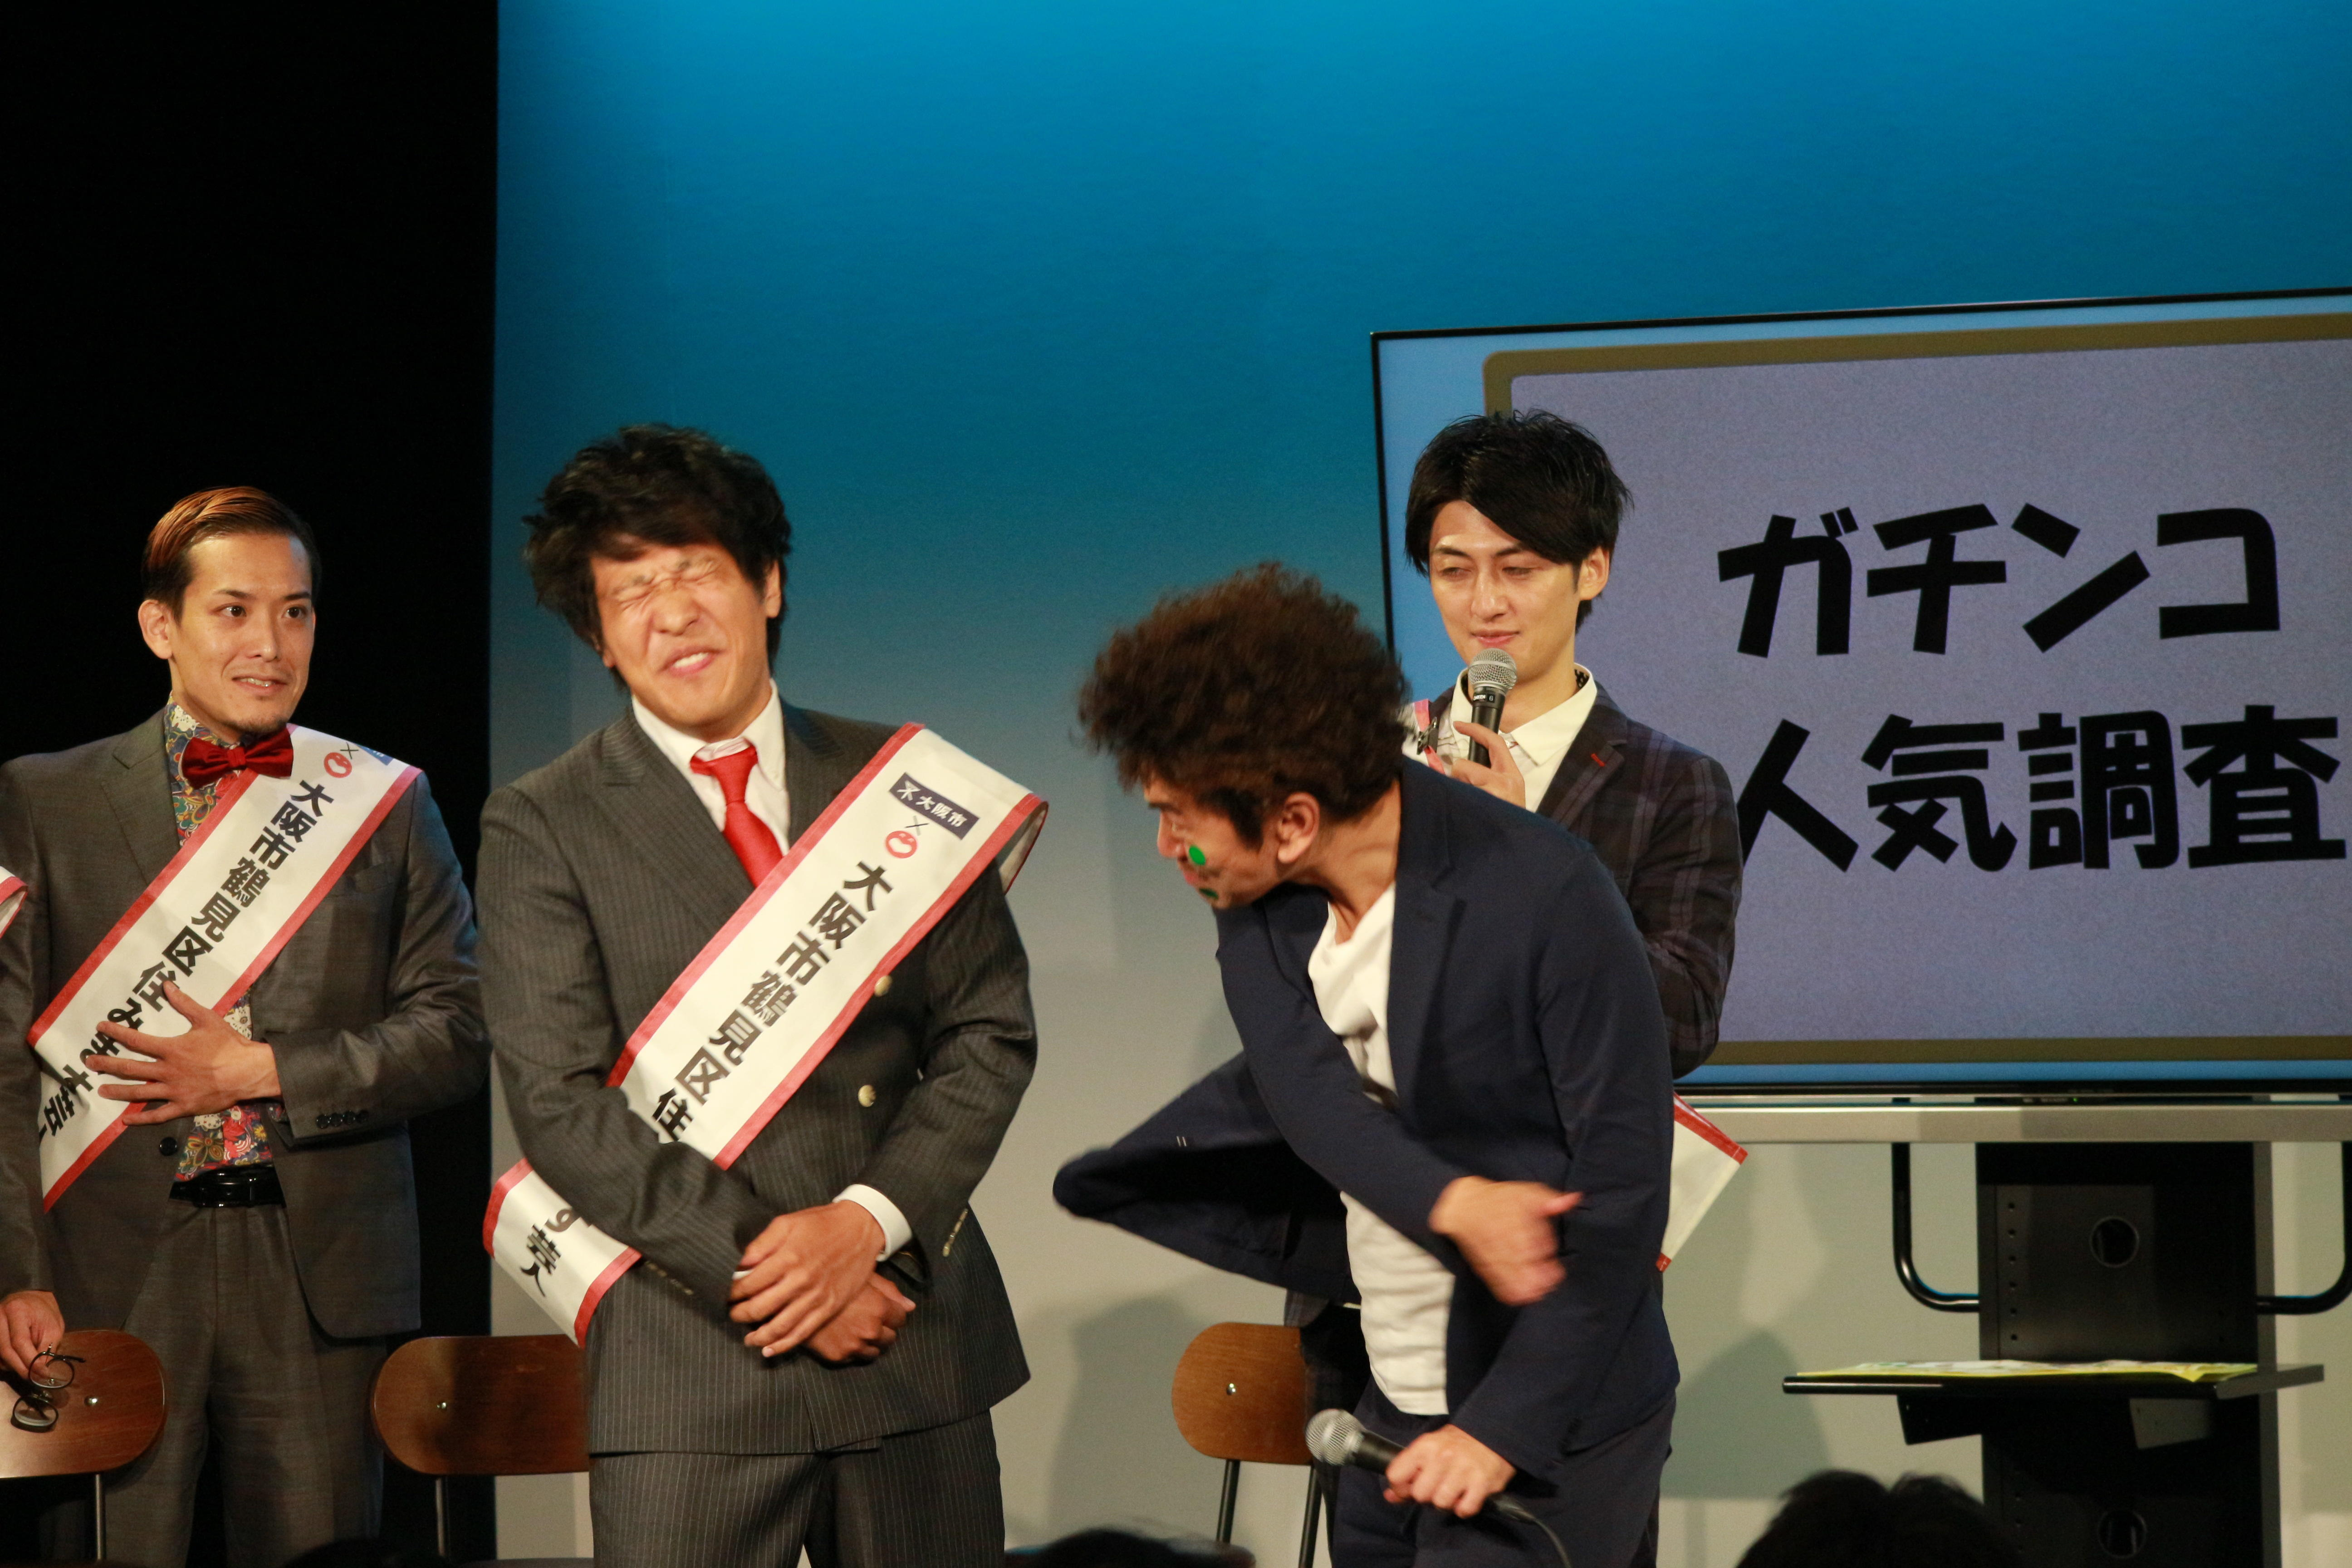 http://news.yoshimoto.co.jp/20180808174302-4c4c3c740cec53ab88245b297ac0819b53e701ca.jpg